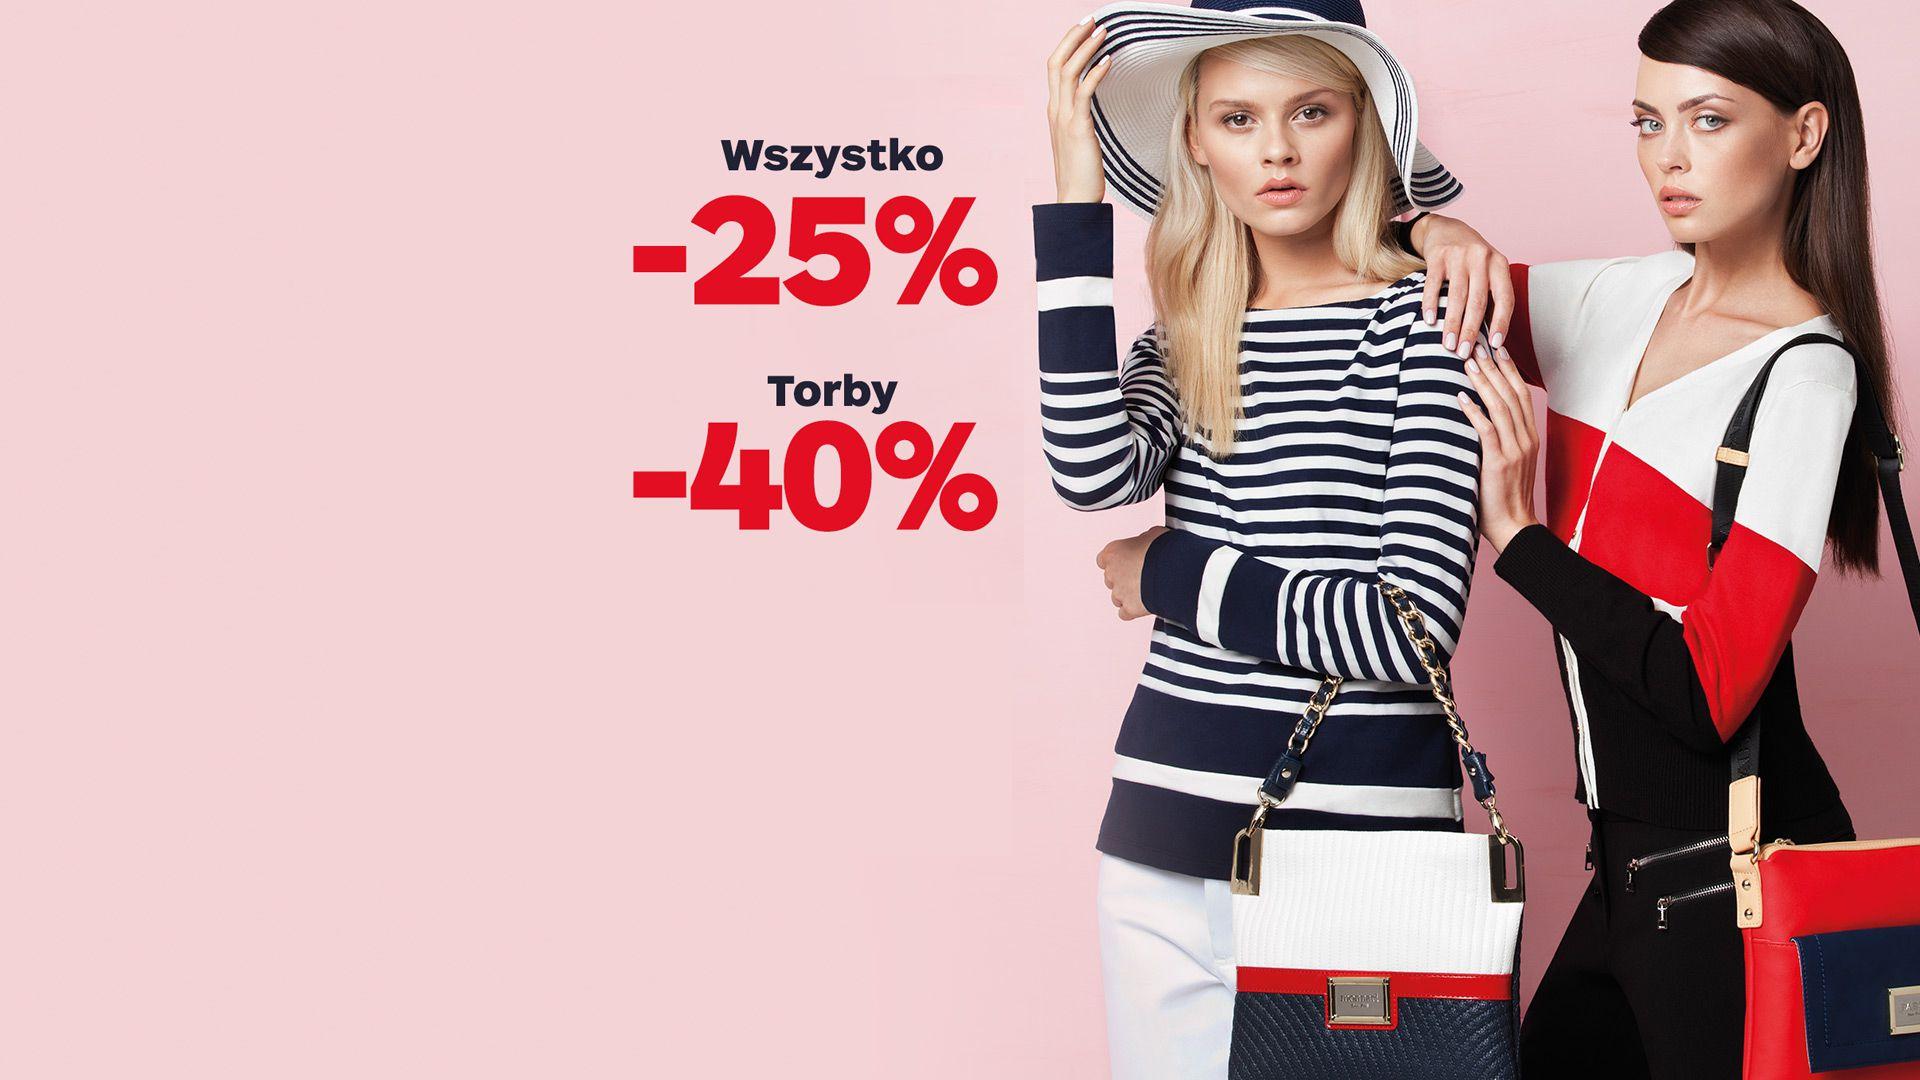 Rabat -40% na torby i -25% na wszystko @ Monnari